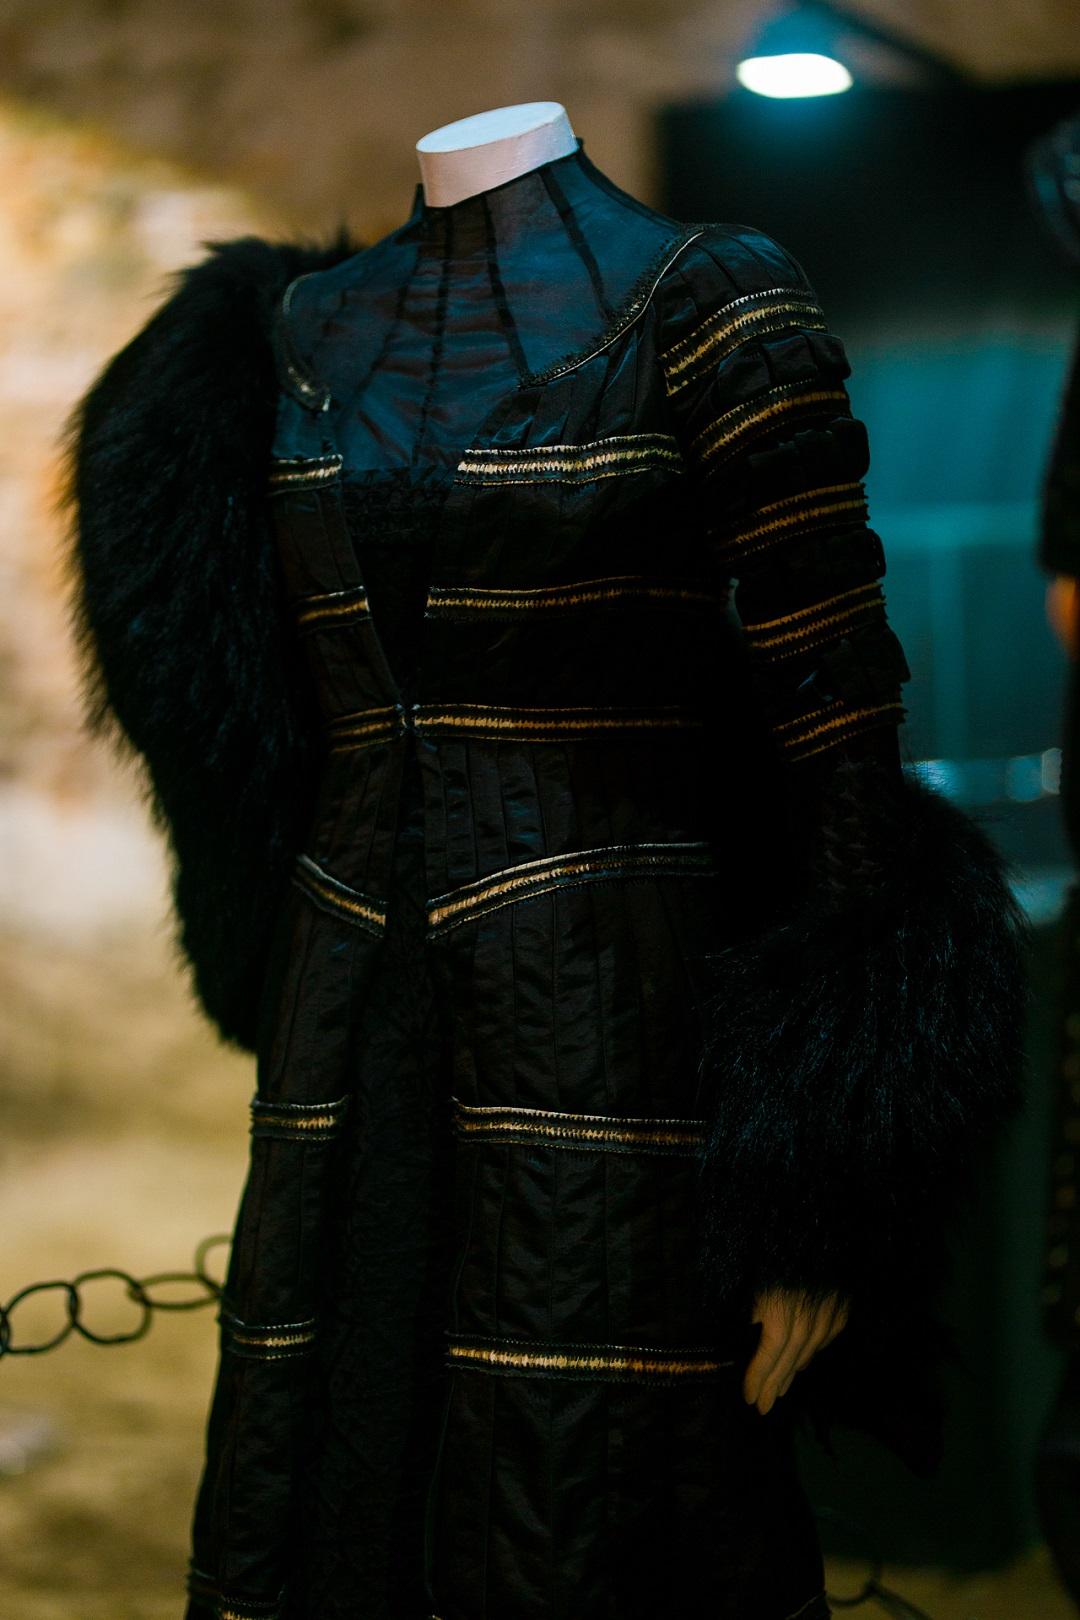 The Witcher Netflix Costumi Lucca Comics & Games 2019 (1)